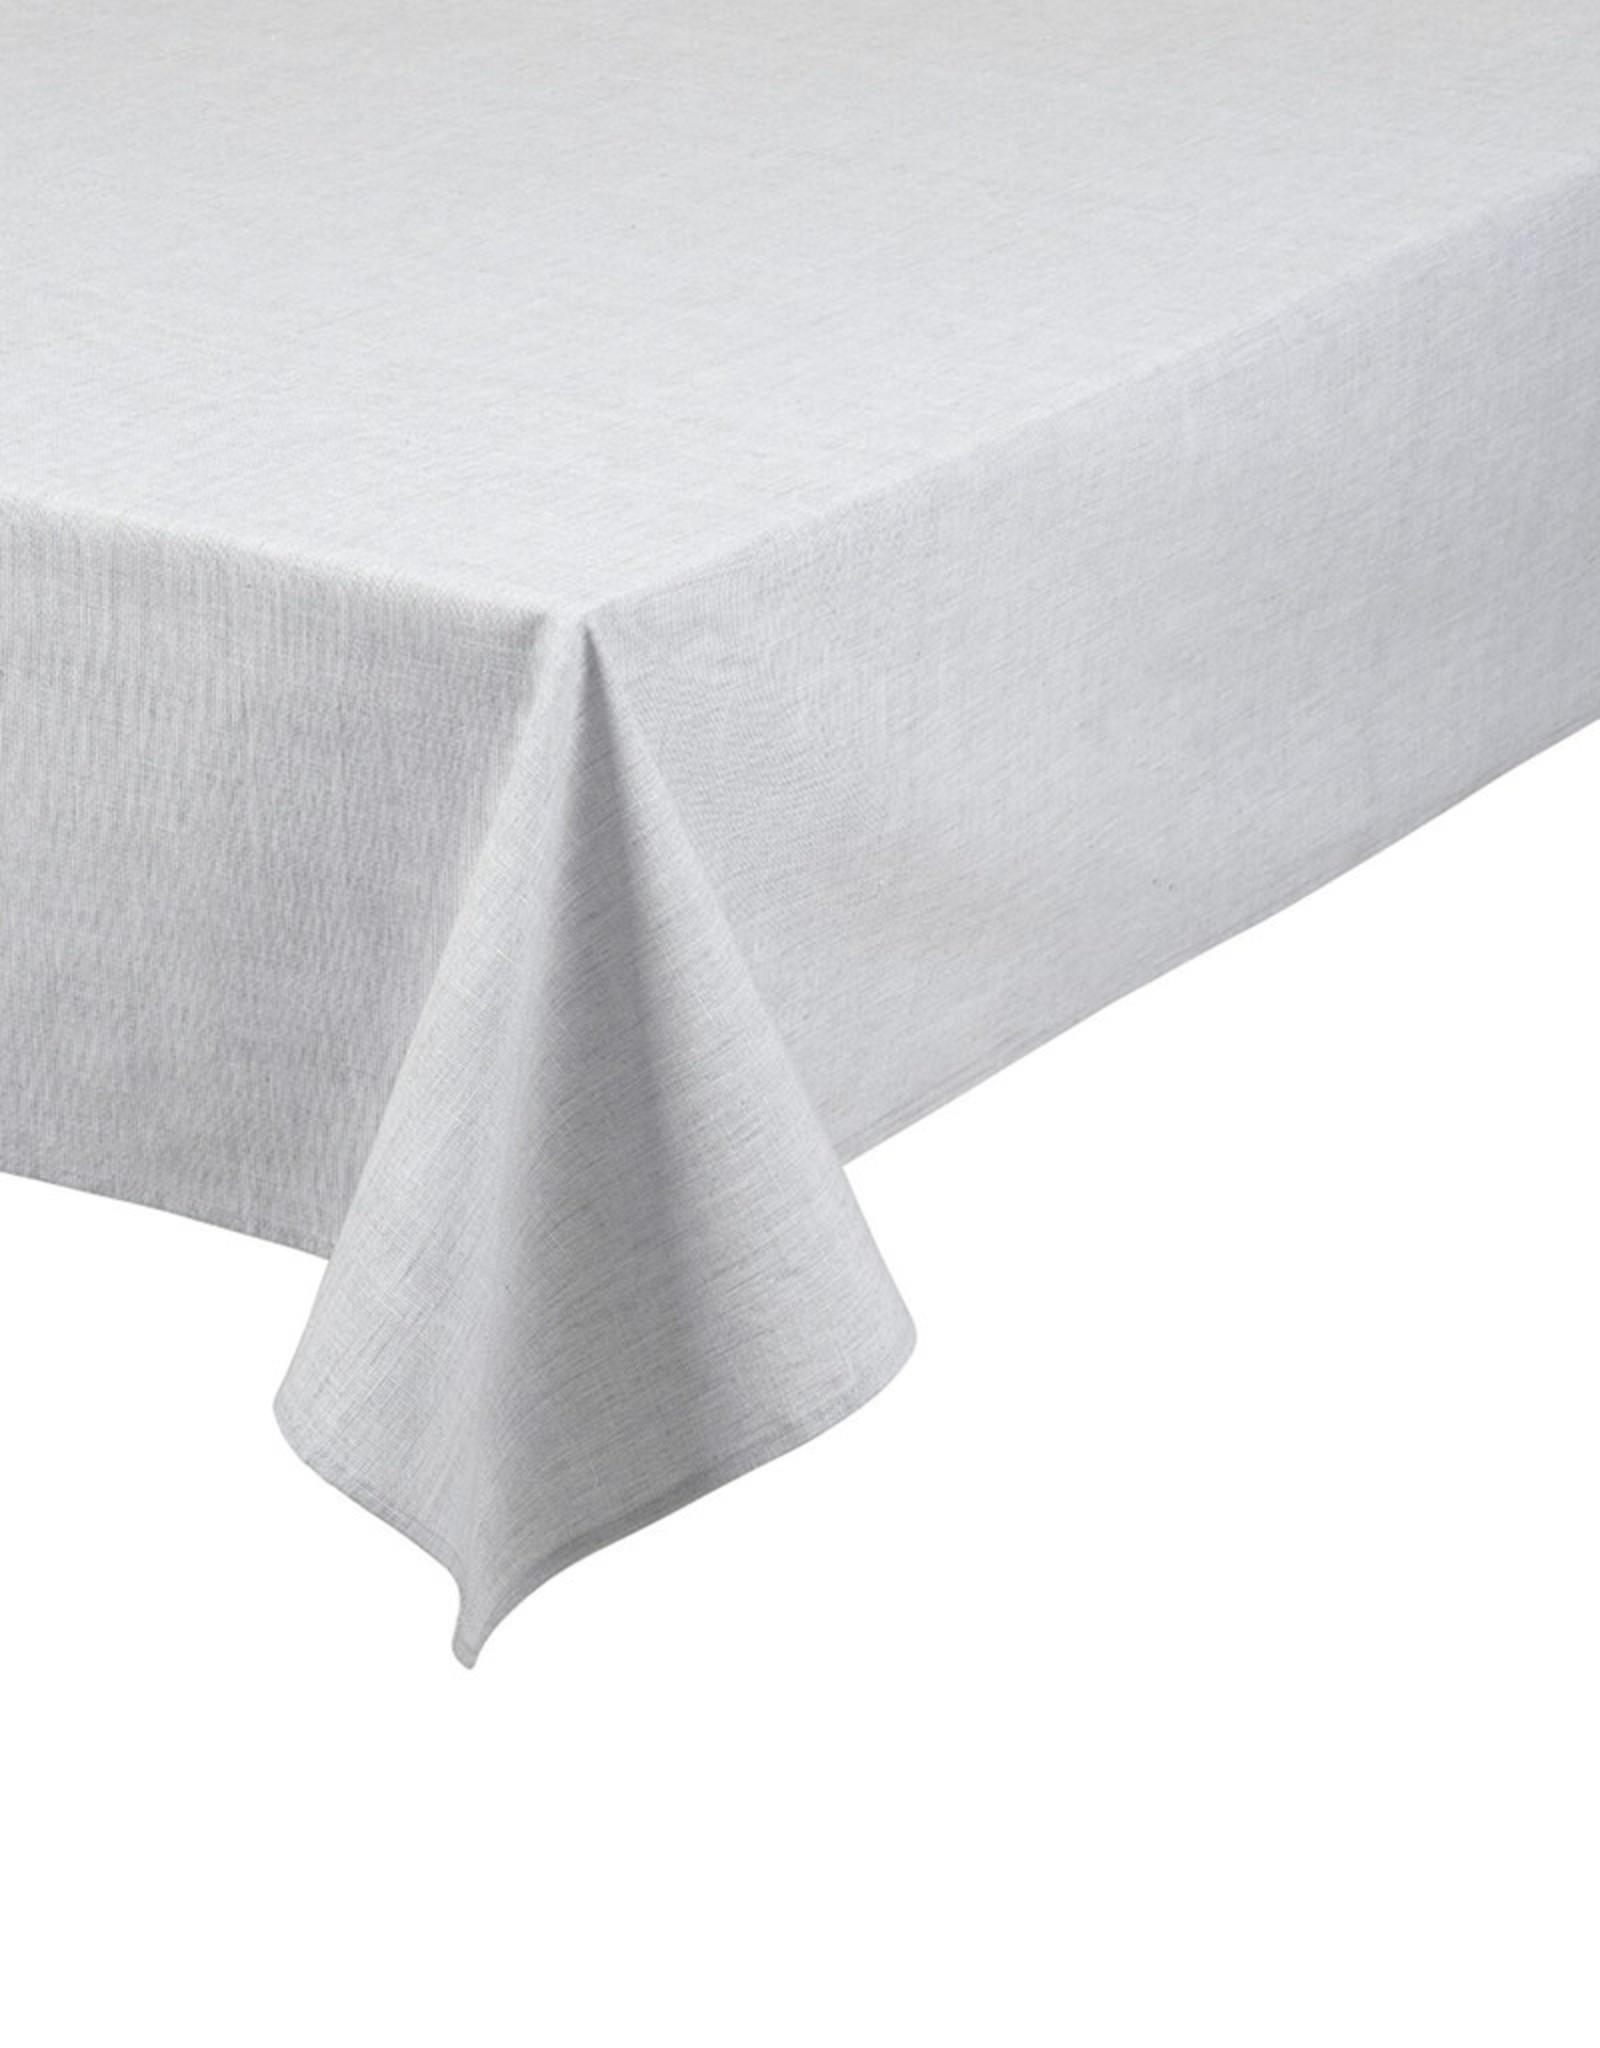 BLOMUS BLOMUS MESA TABLE CLOTH ELEPHANT SKIN 140x260